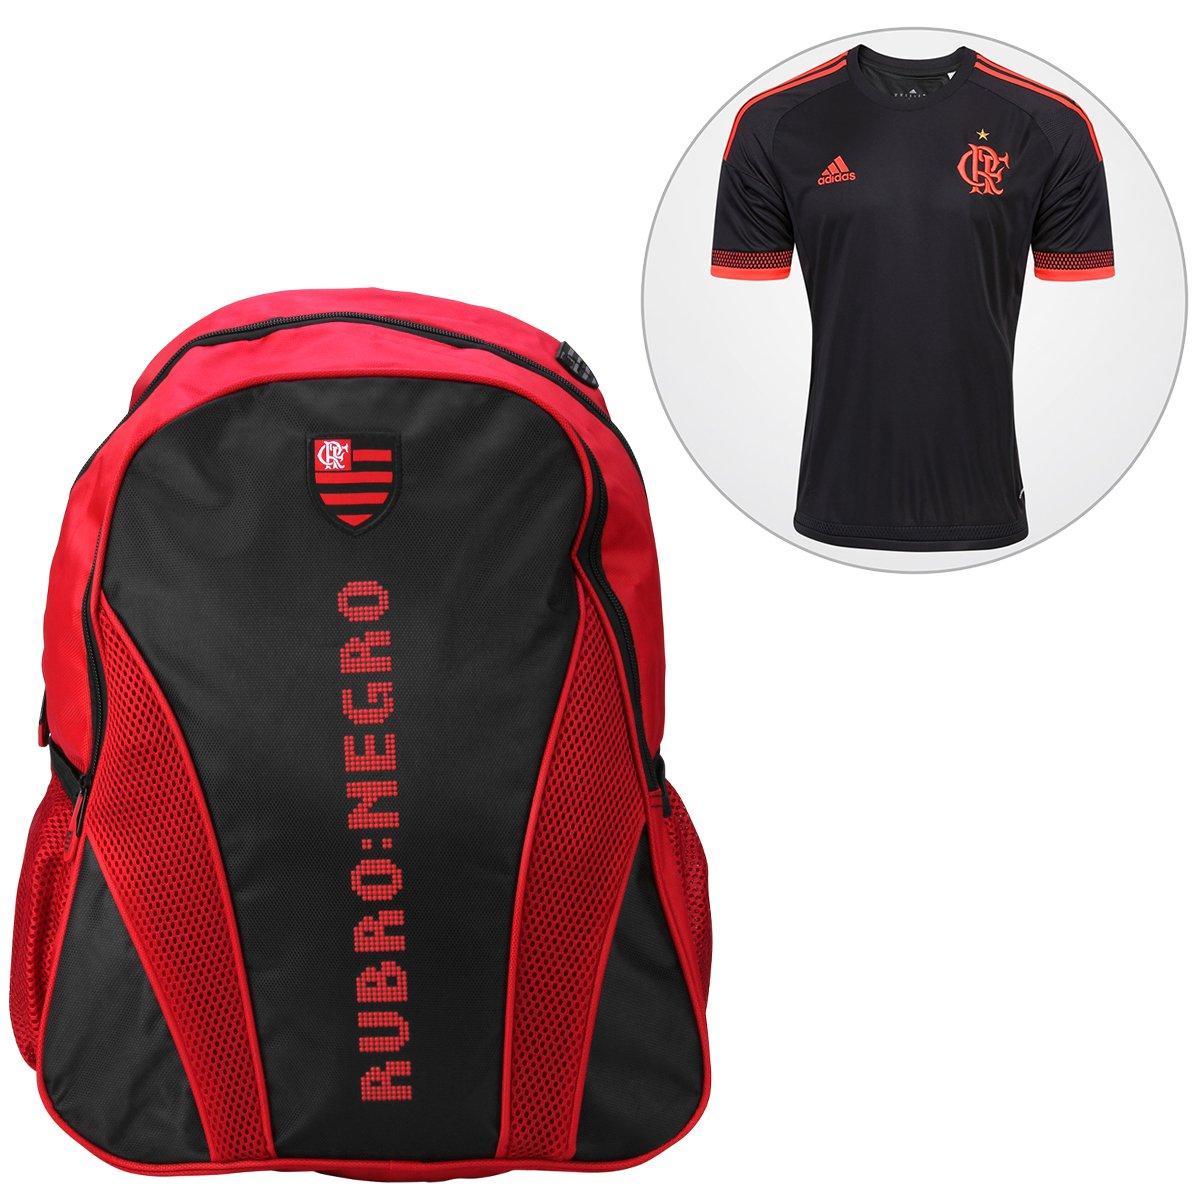 Kit Camisa Adidas Flamengo III 2016 s nº + Mochila Flamengo - Compre Agora   4a7cc62566a04